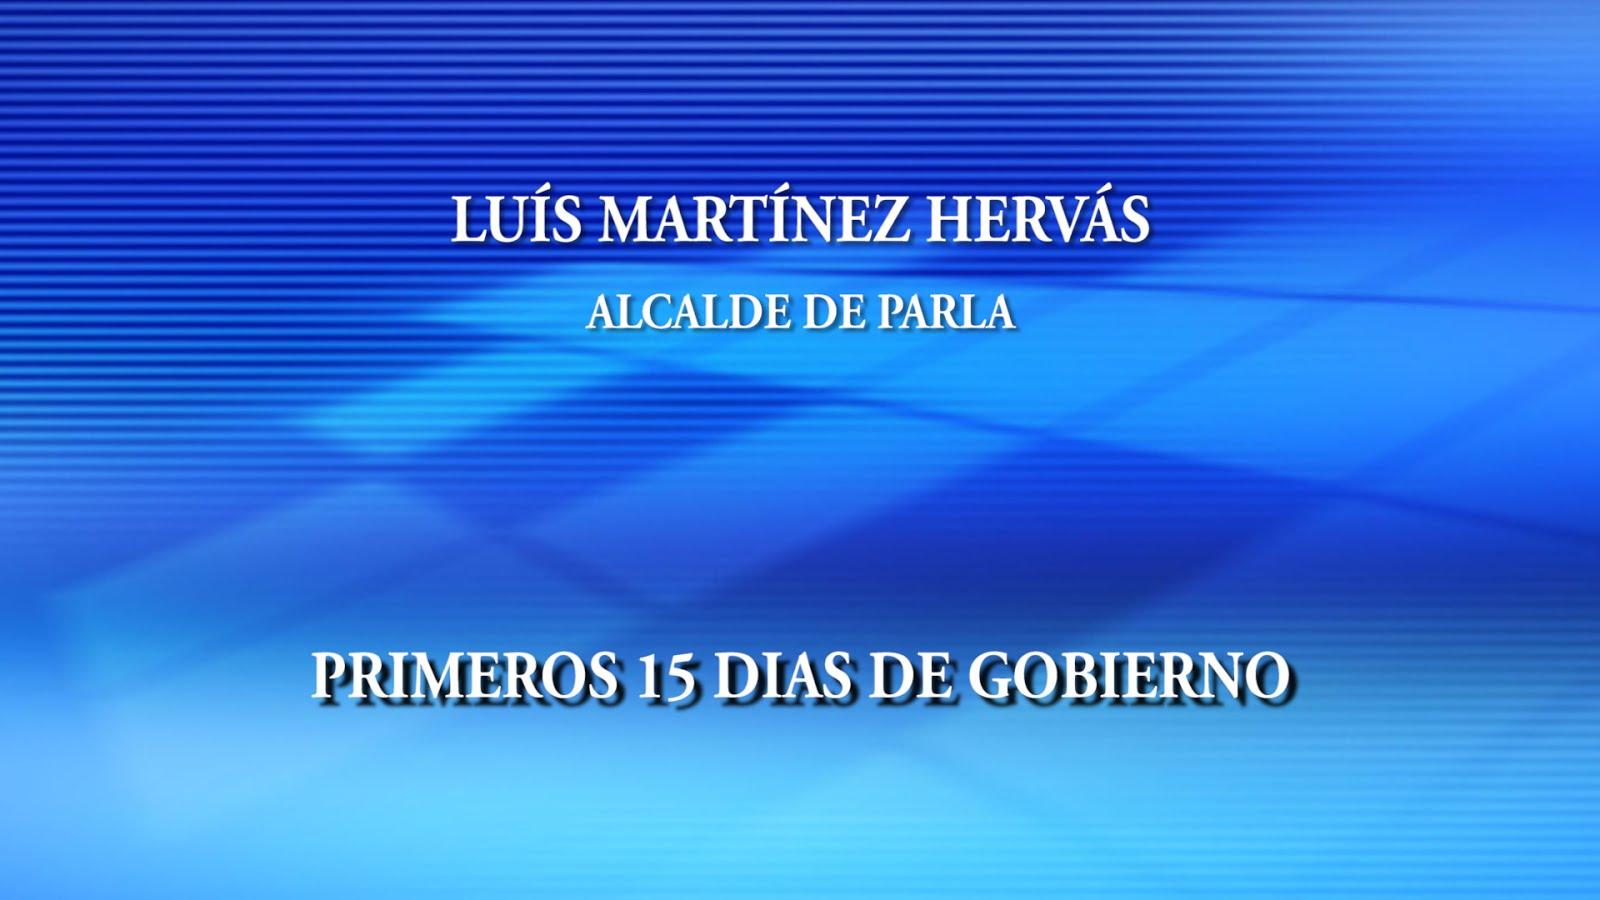 LUIS MARTINEZ HERVAS - Alcalde de Parla